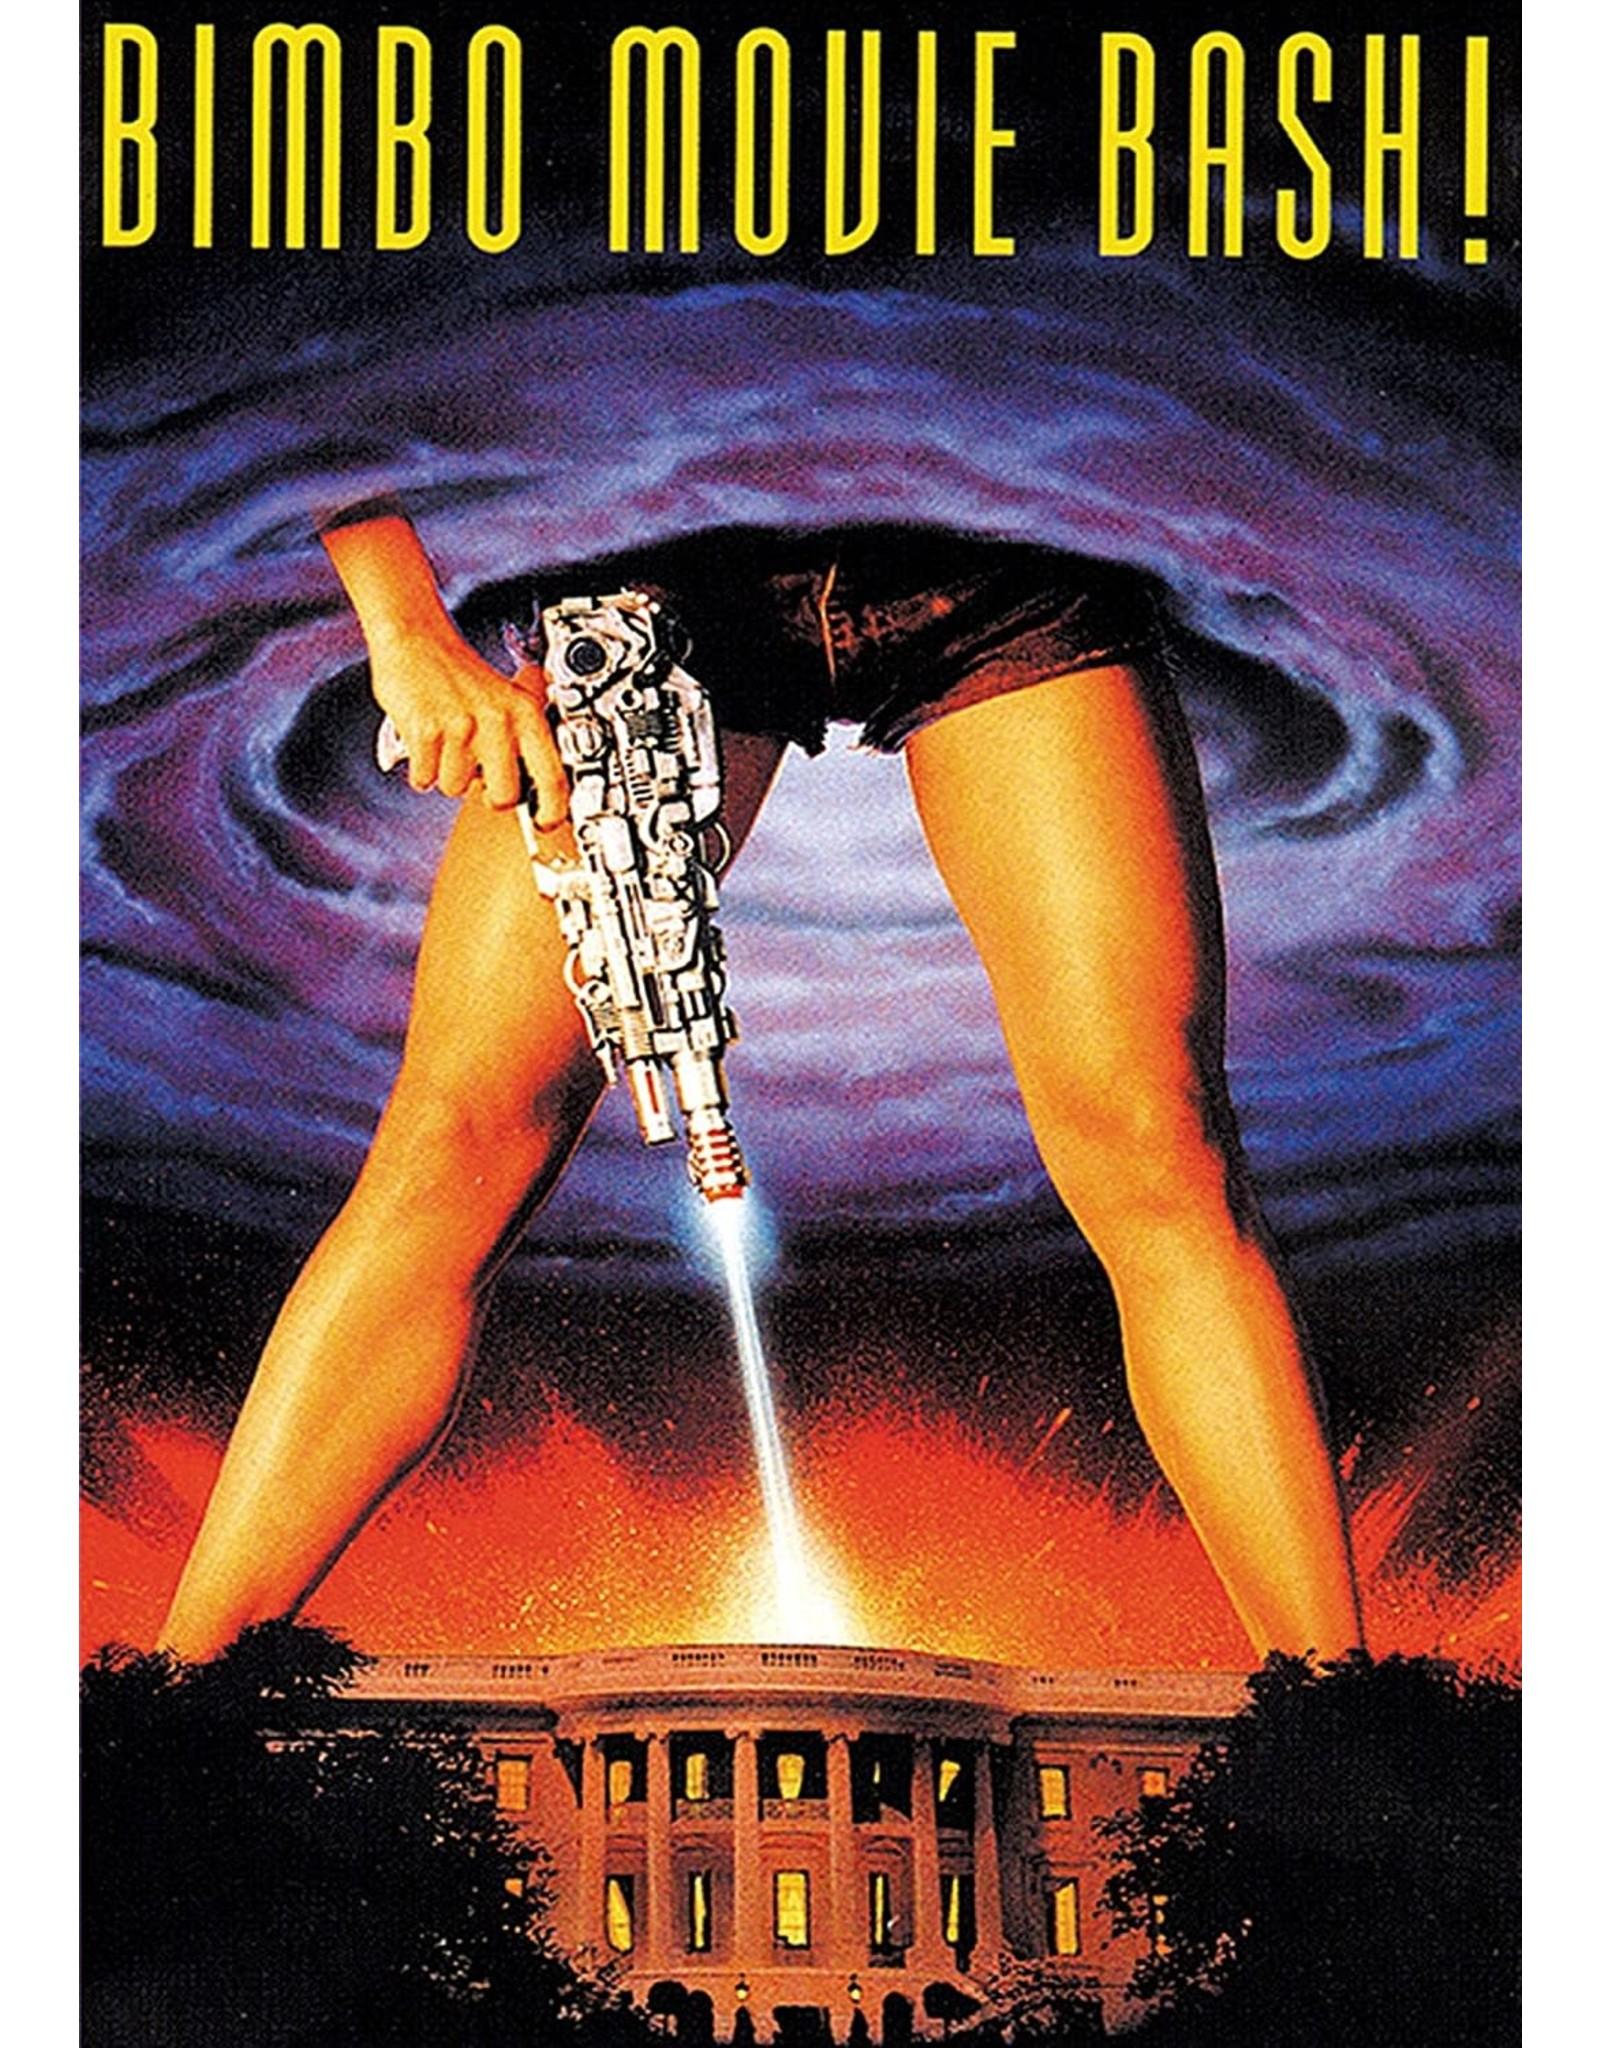 Cult and Cool Bimbo Movie Bash! (Brand New)